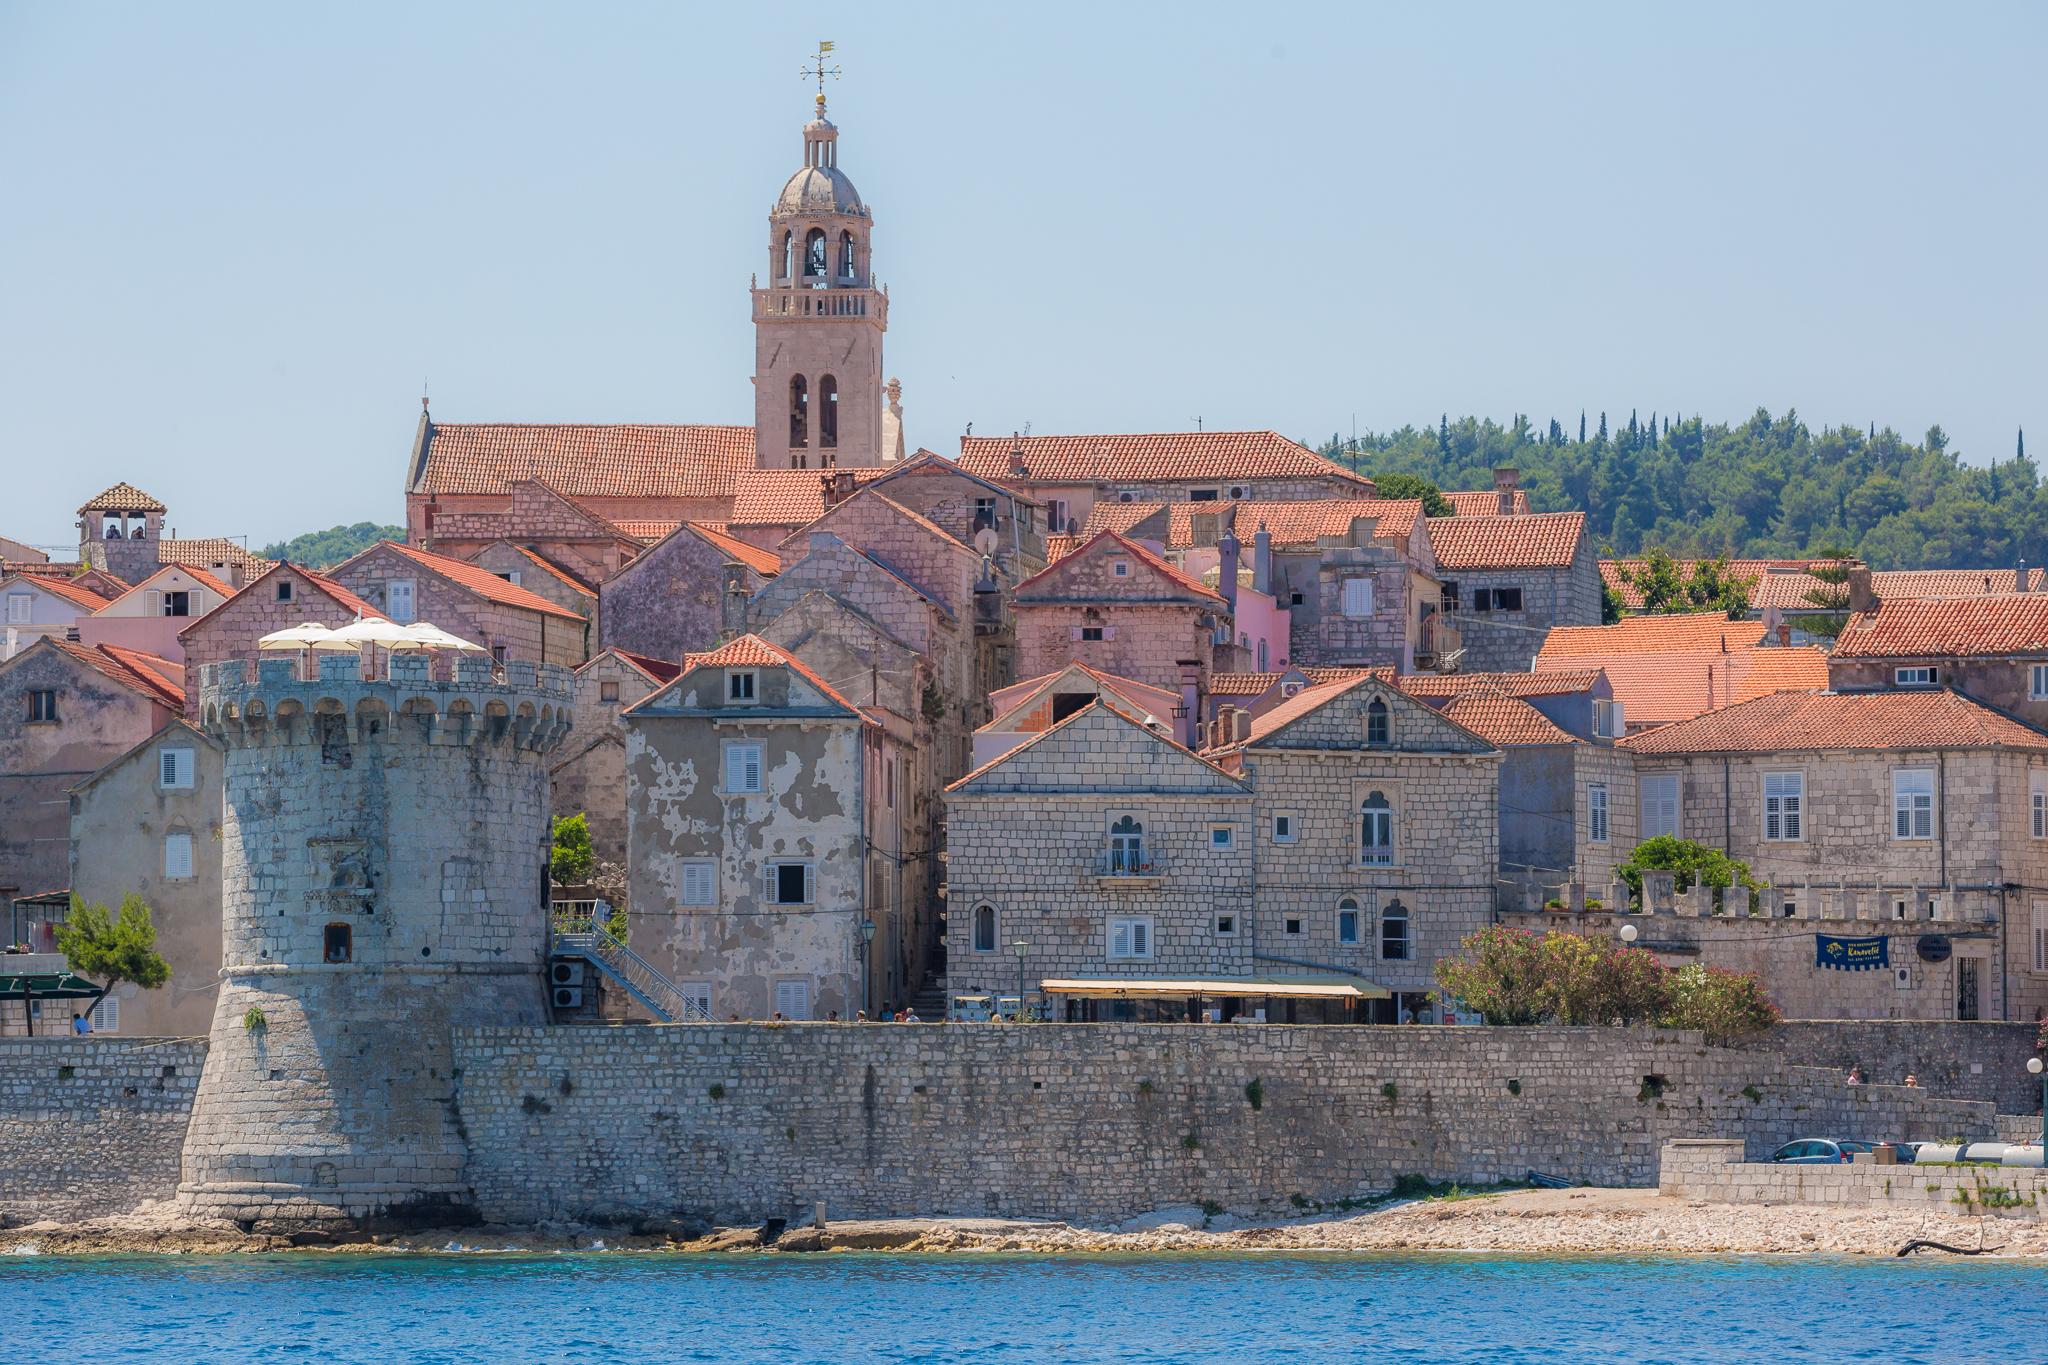 LBW_Croatia_YouVisit_iWally-18.jpg